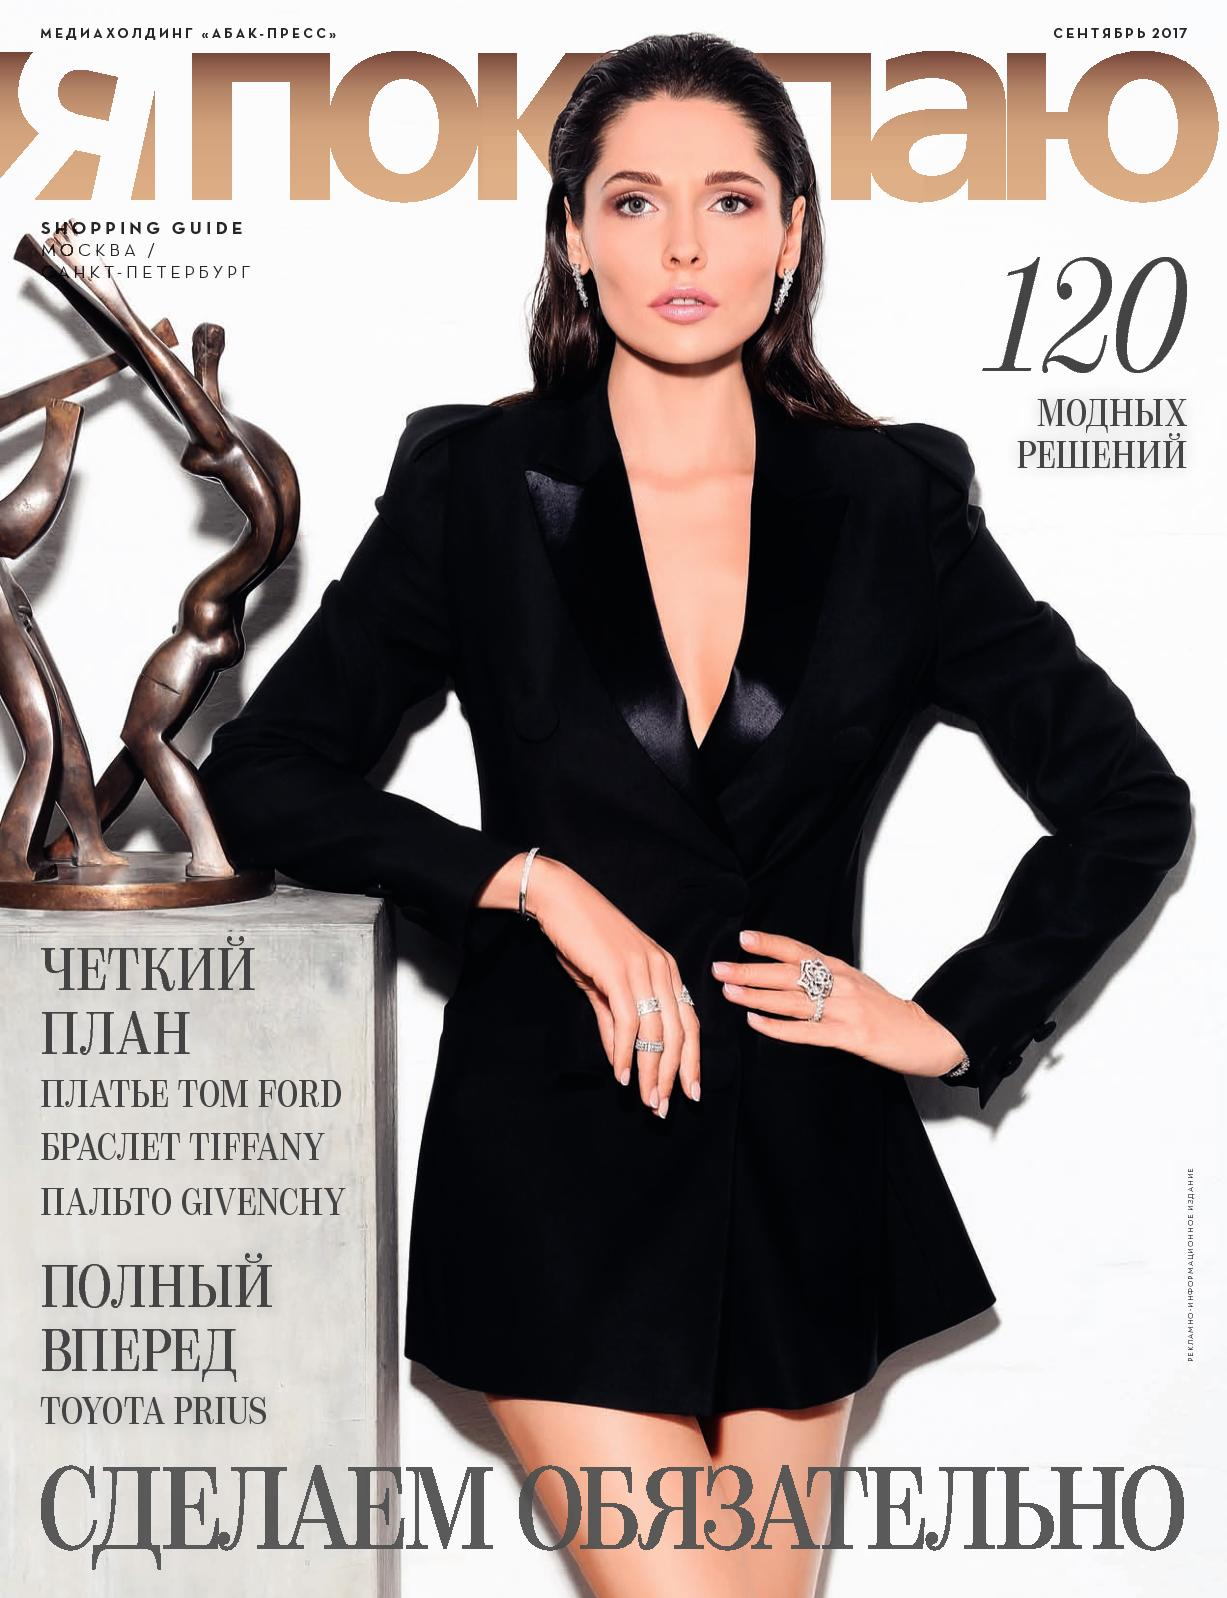 a7466ade768 Calaméo - Shopping Guide «Я Покупаю. Москва - Санкт-Петербург ...